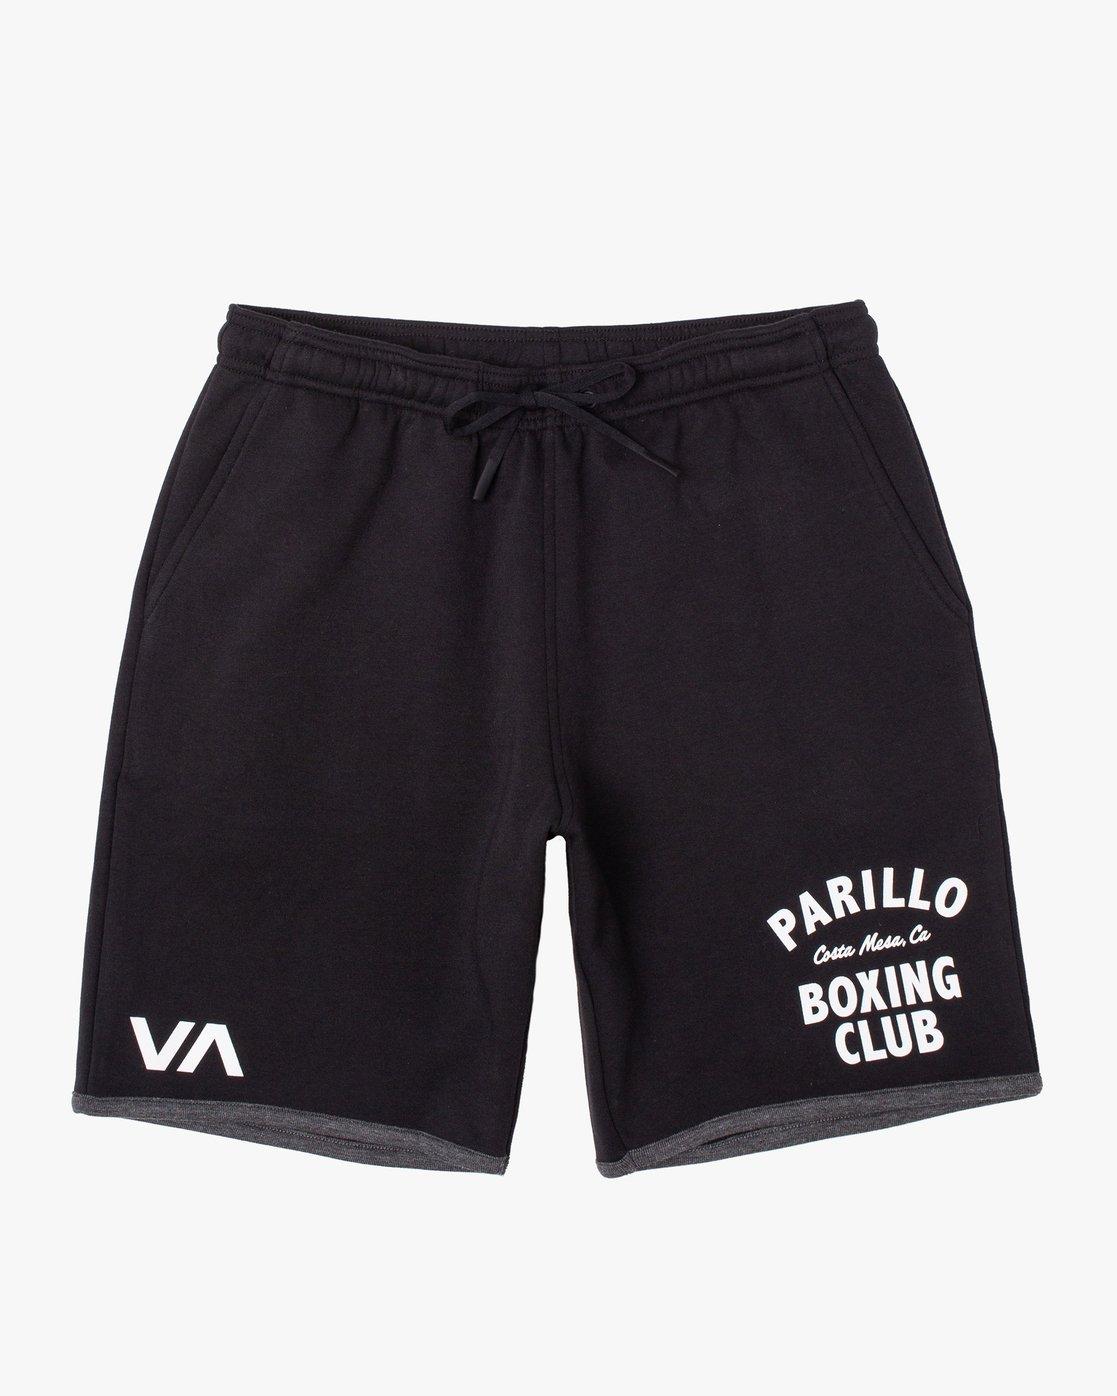 "0 VA Sport Parillo - Sport Shorts 17"" for Men Black W4WKMNRVP1 RVCA"